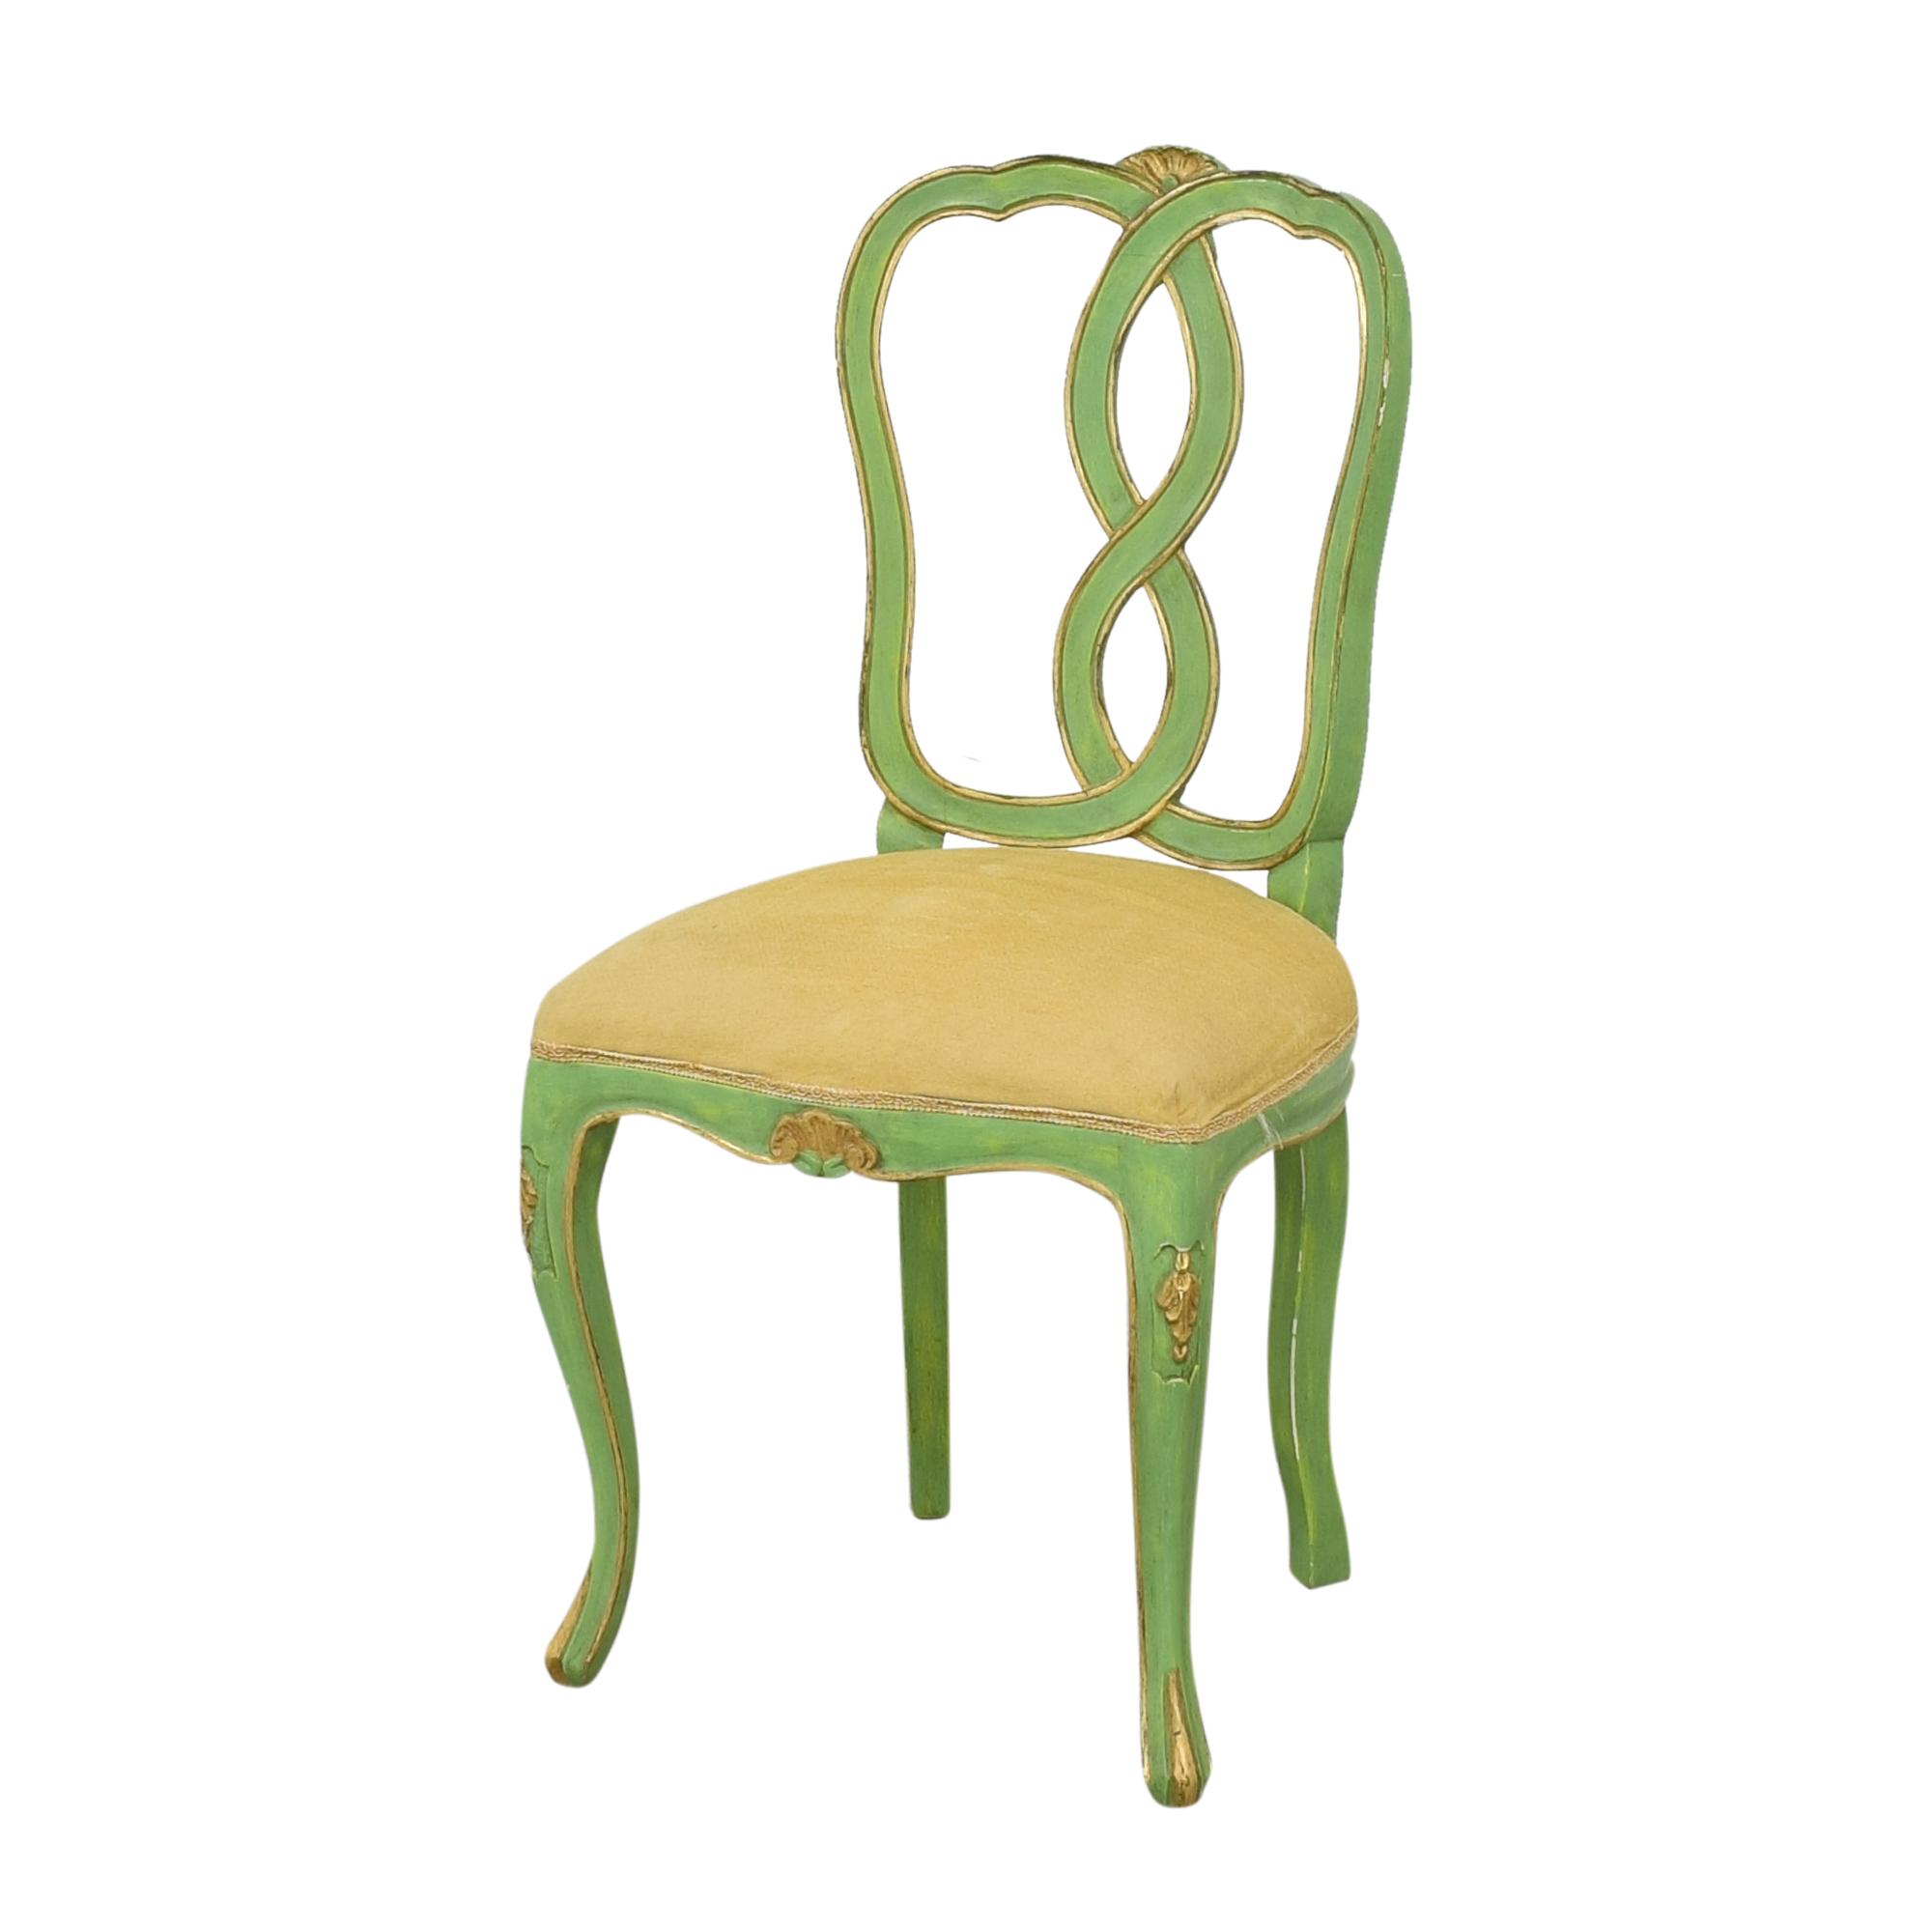 Bergdorf Goodman Bergdorf Goodman Green and Gold Chairs nj